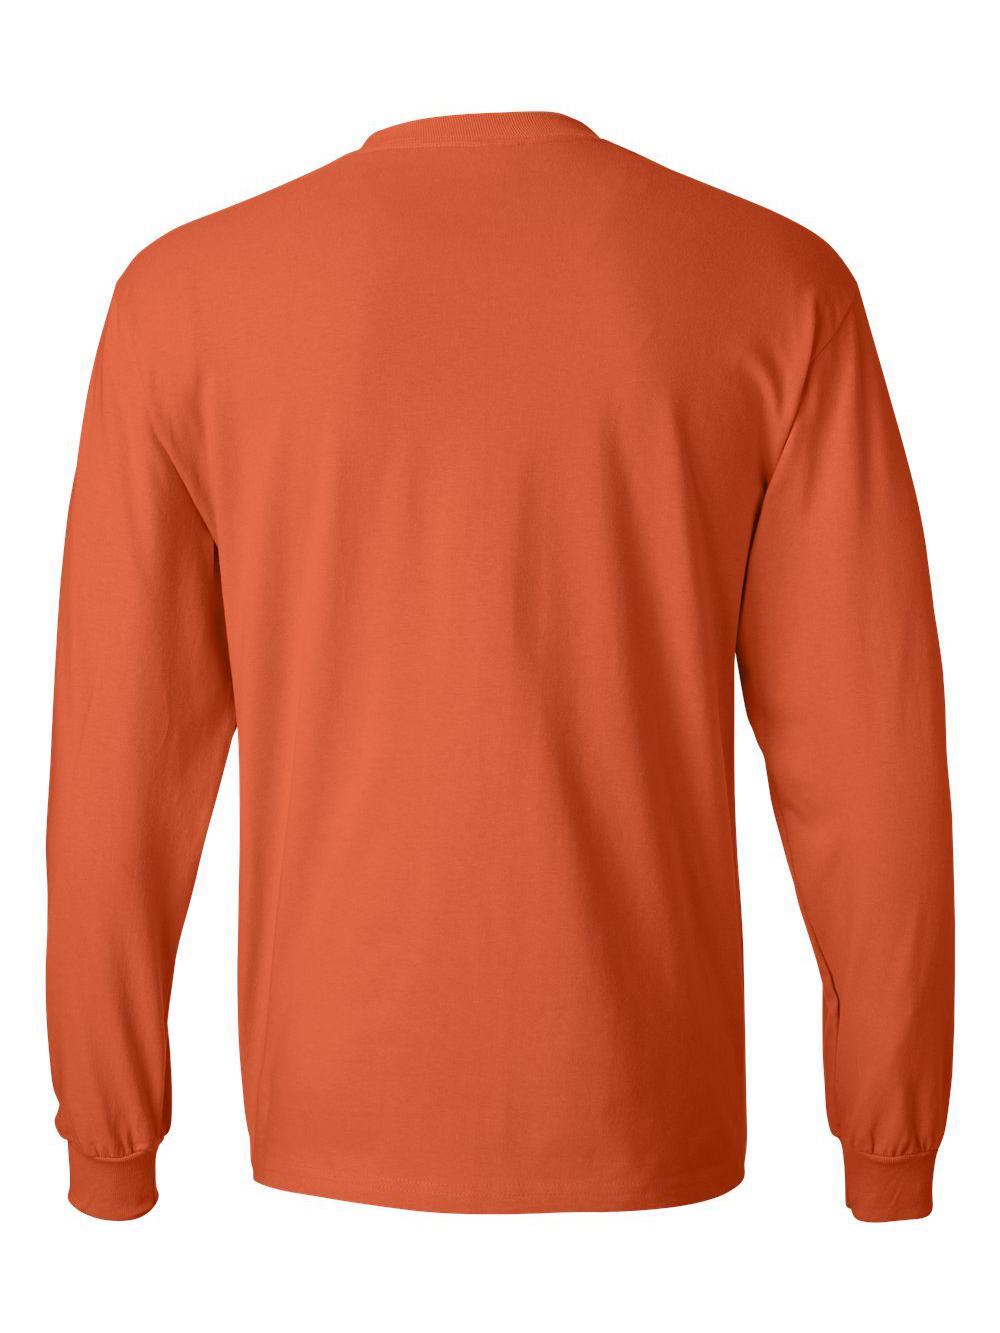 Hanes-Beefy-T-Long-Sleeve-T-Shirt-5186 thumbnail 43